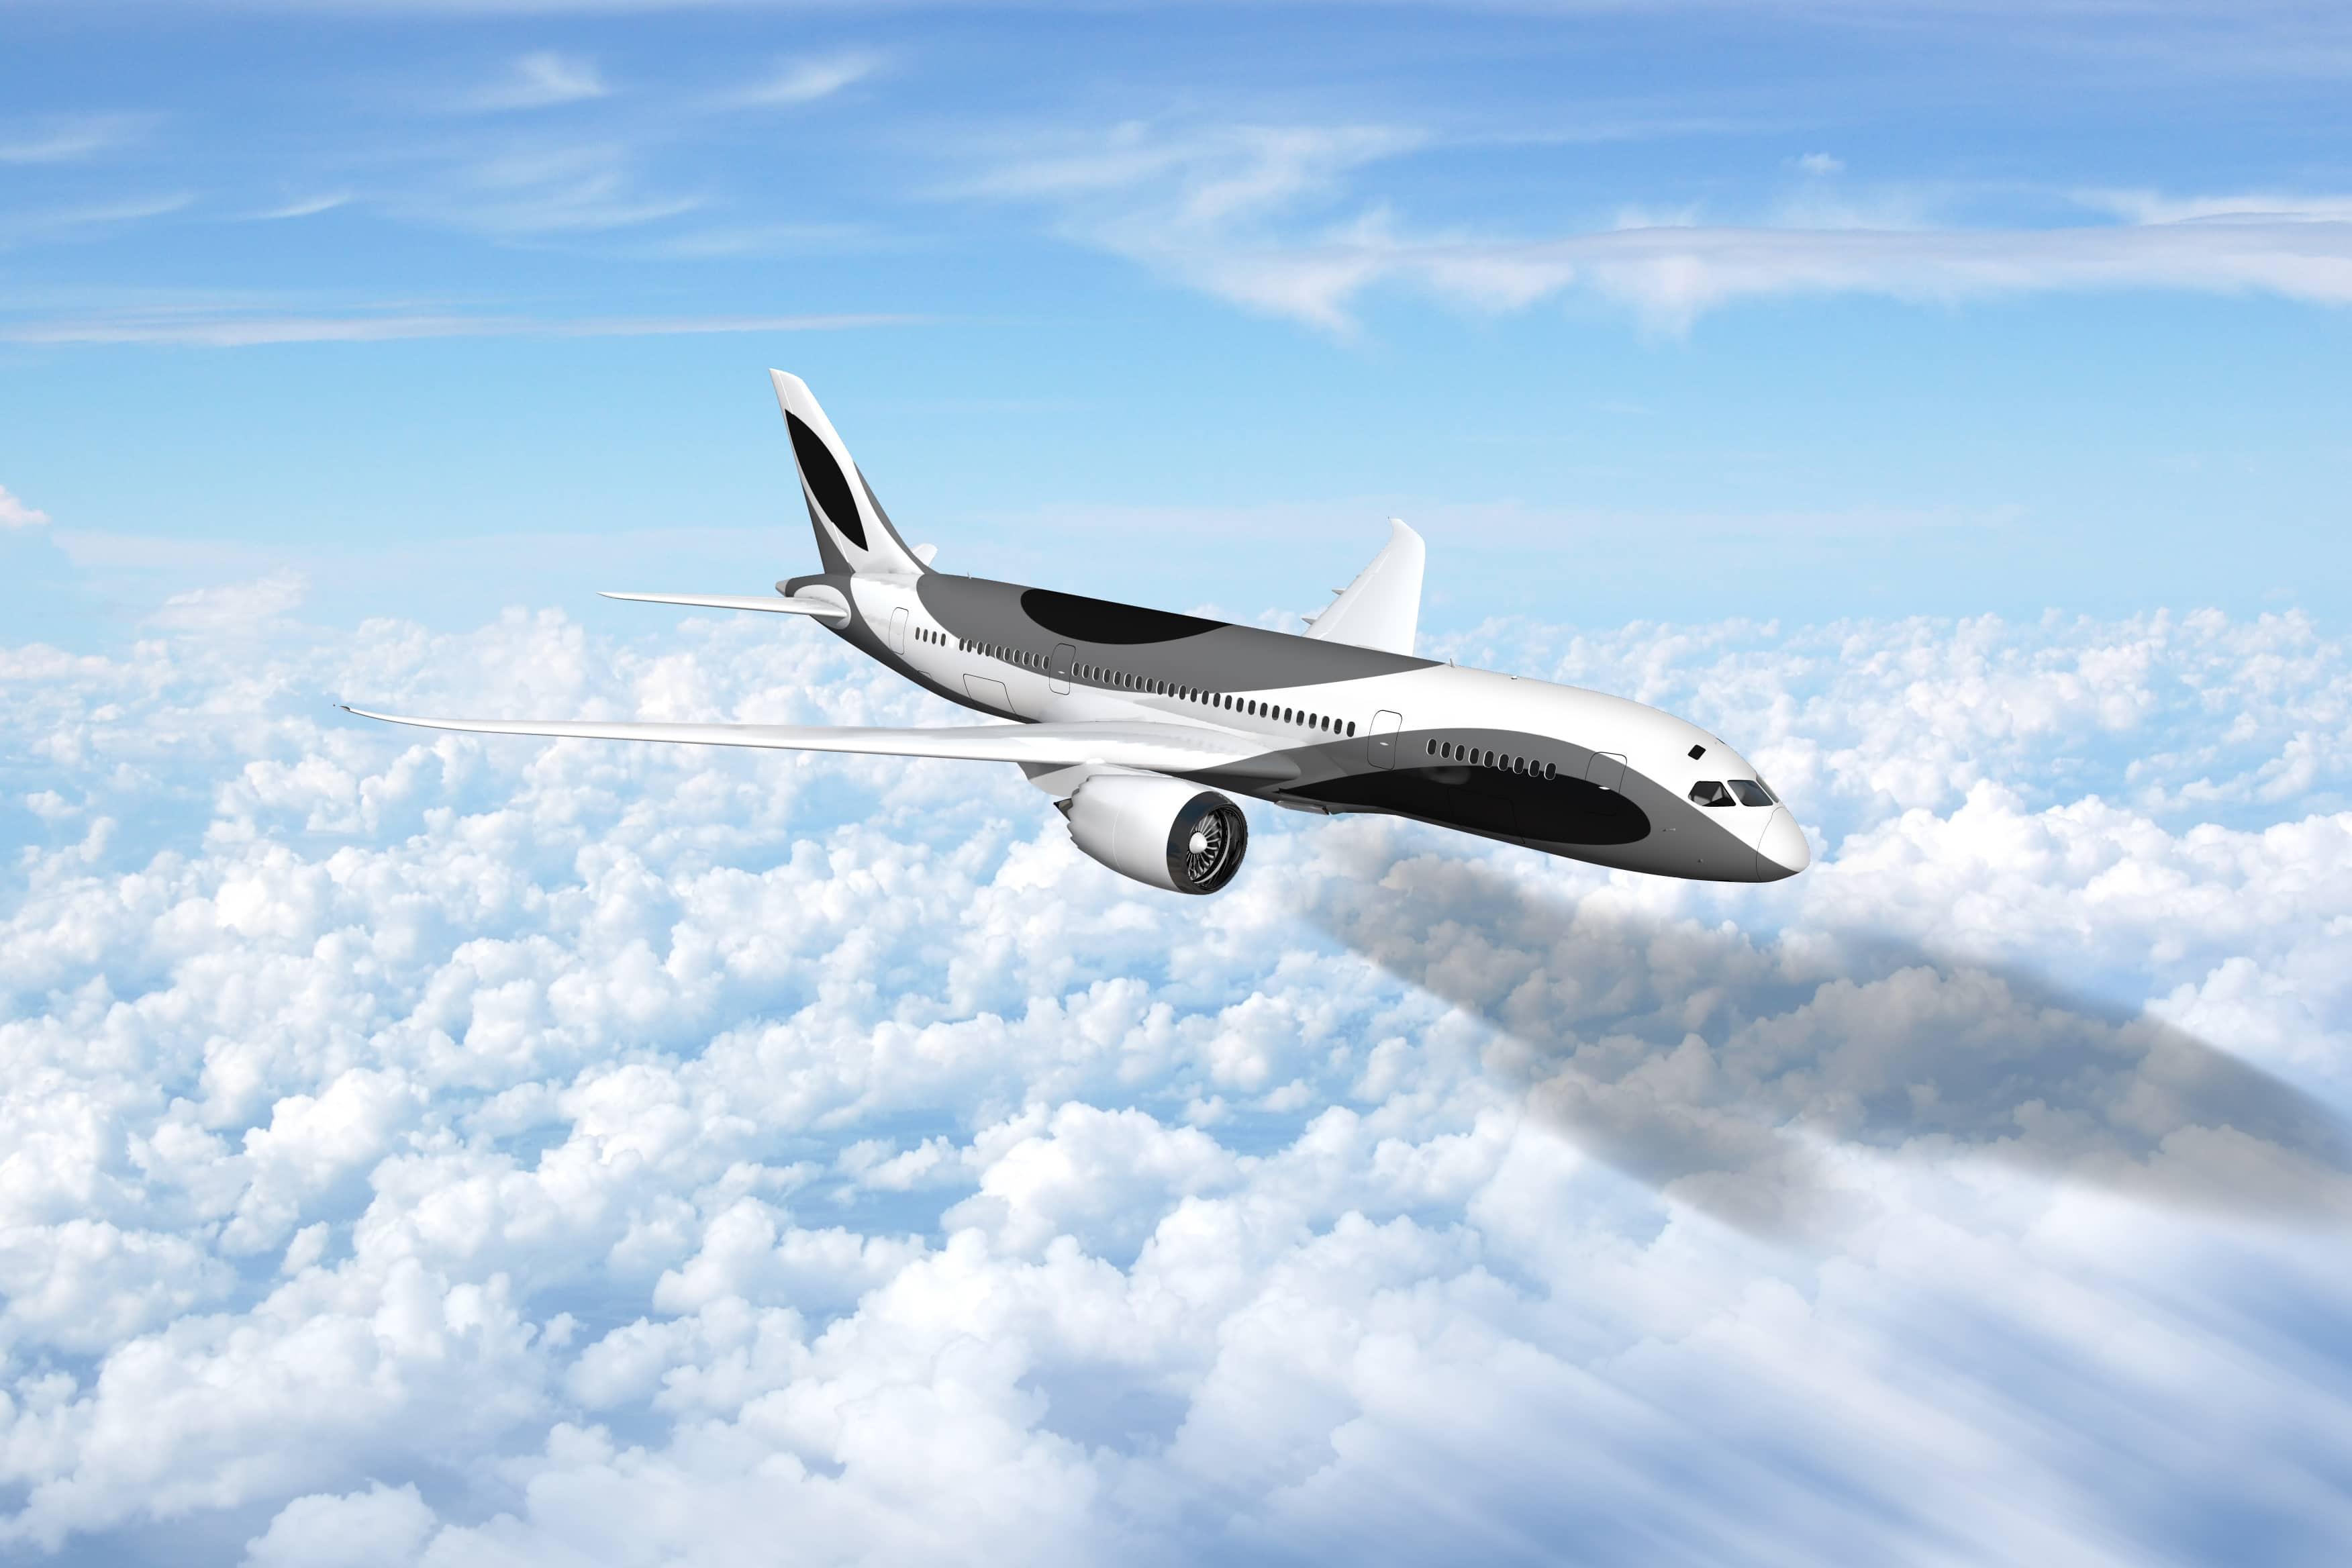 Bespoke Jet Design